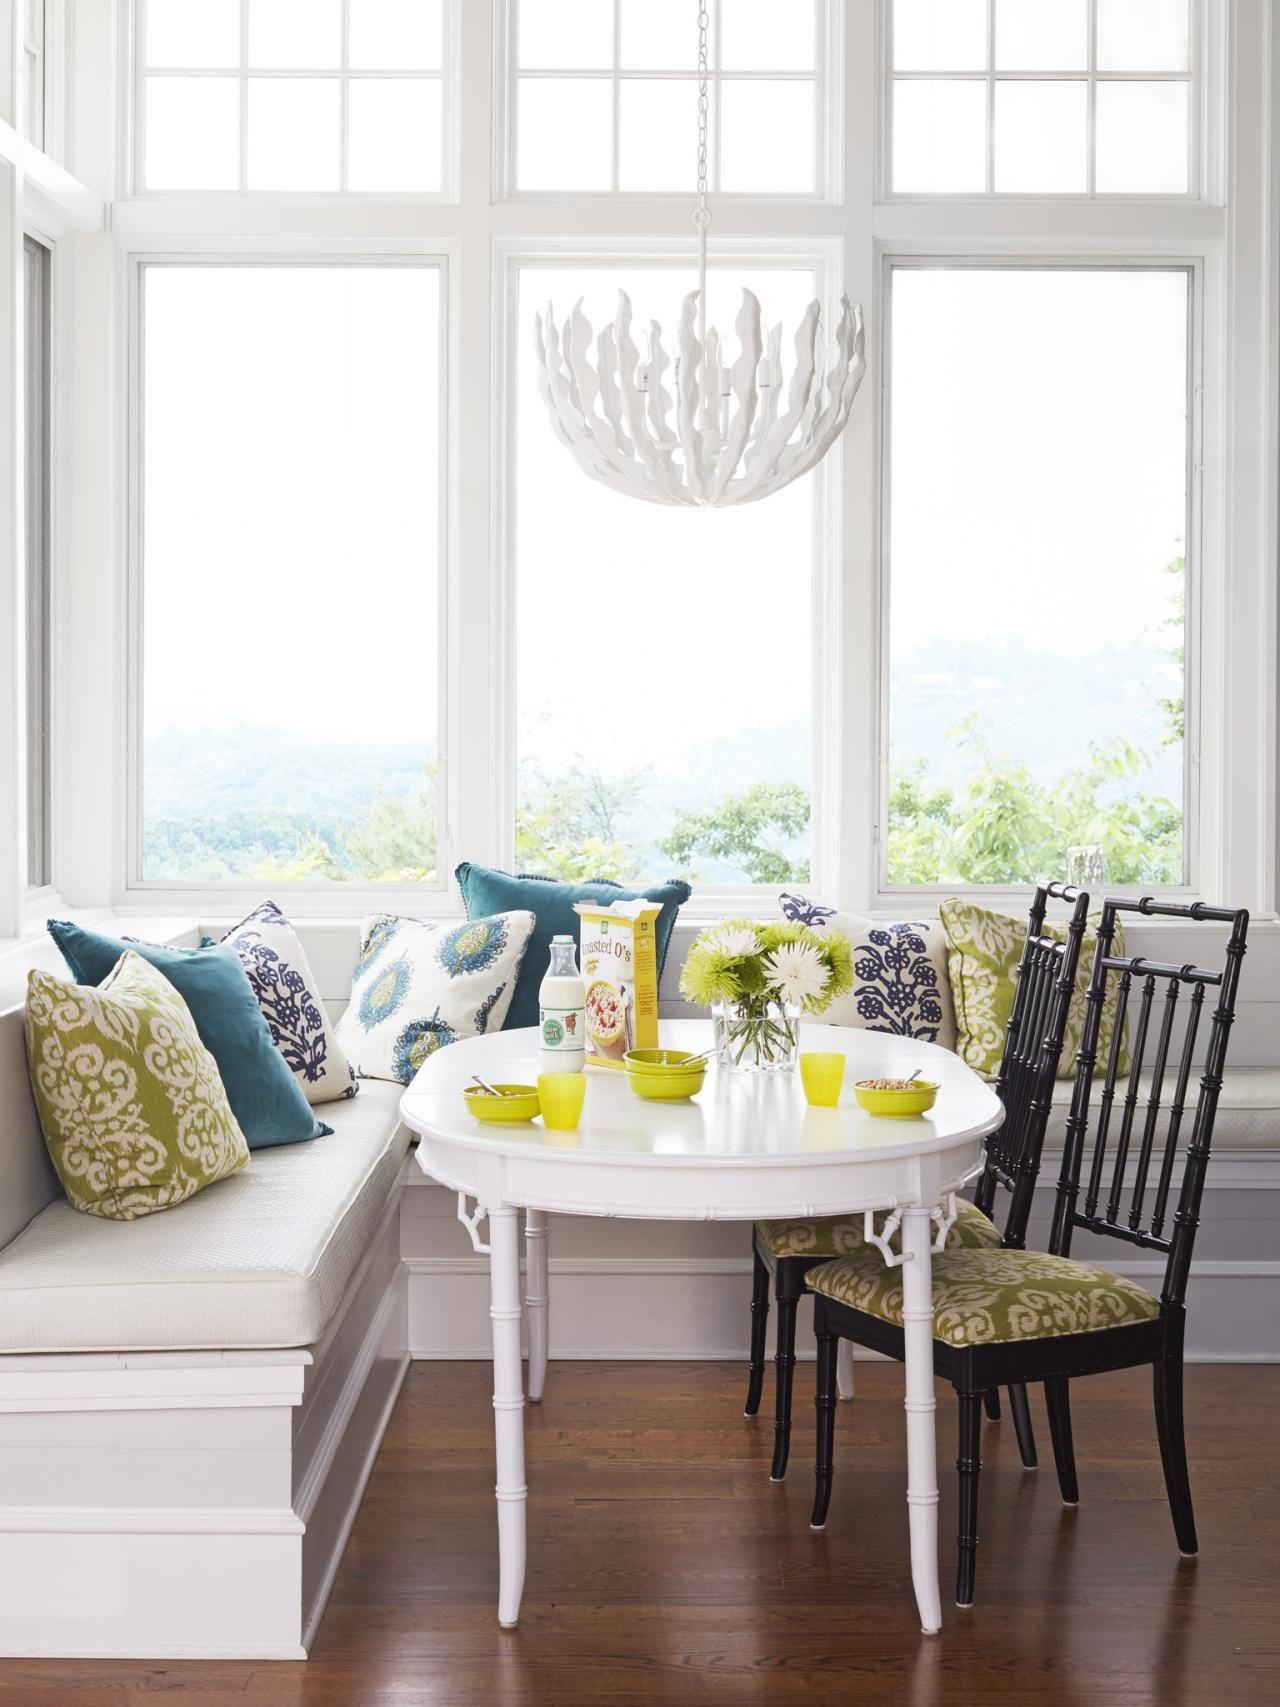 Summer Decorating Ideas - Preppy Interiors